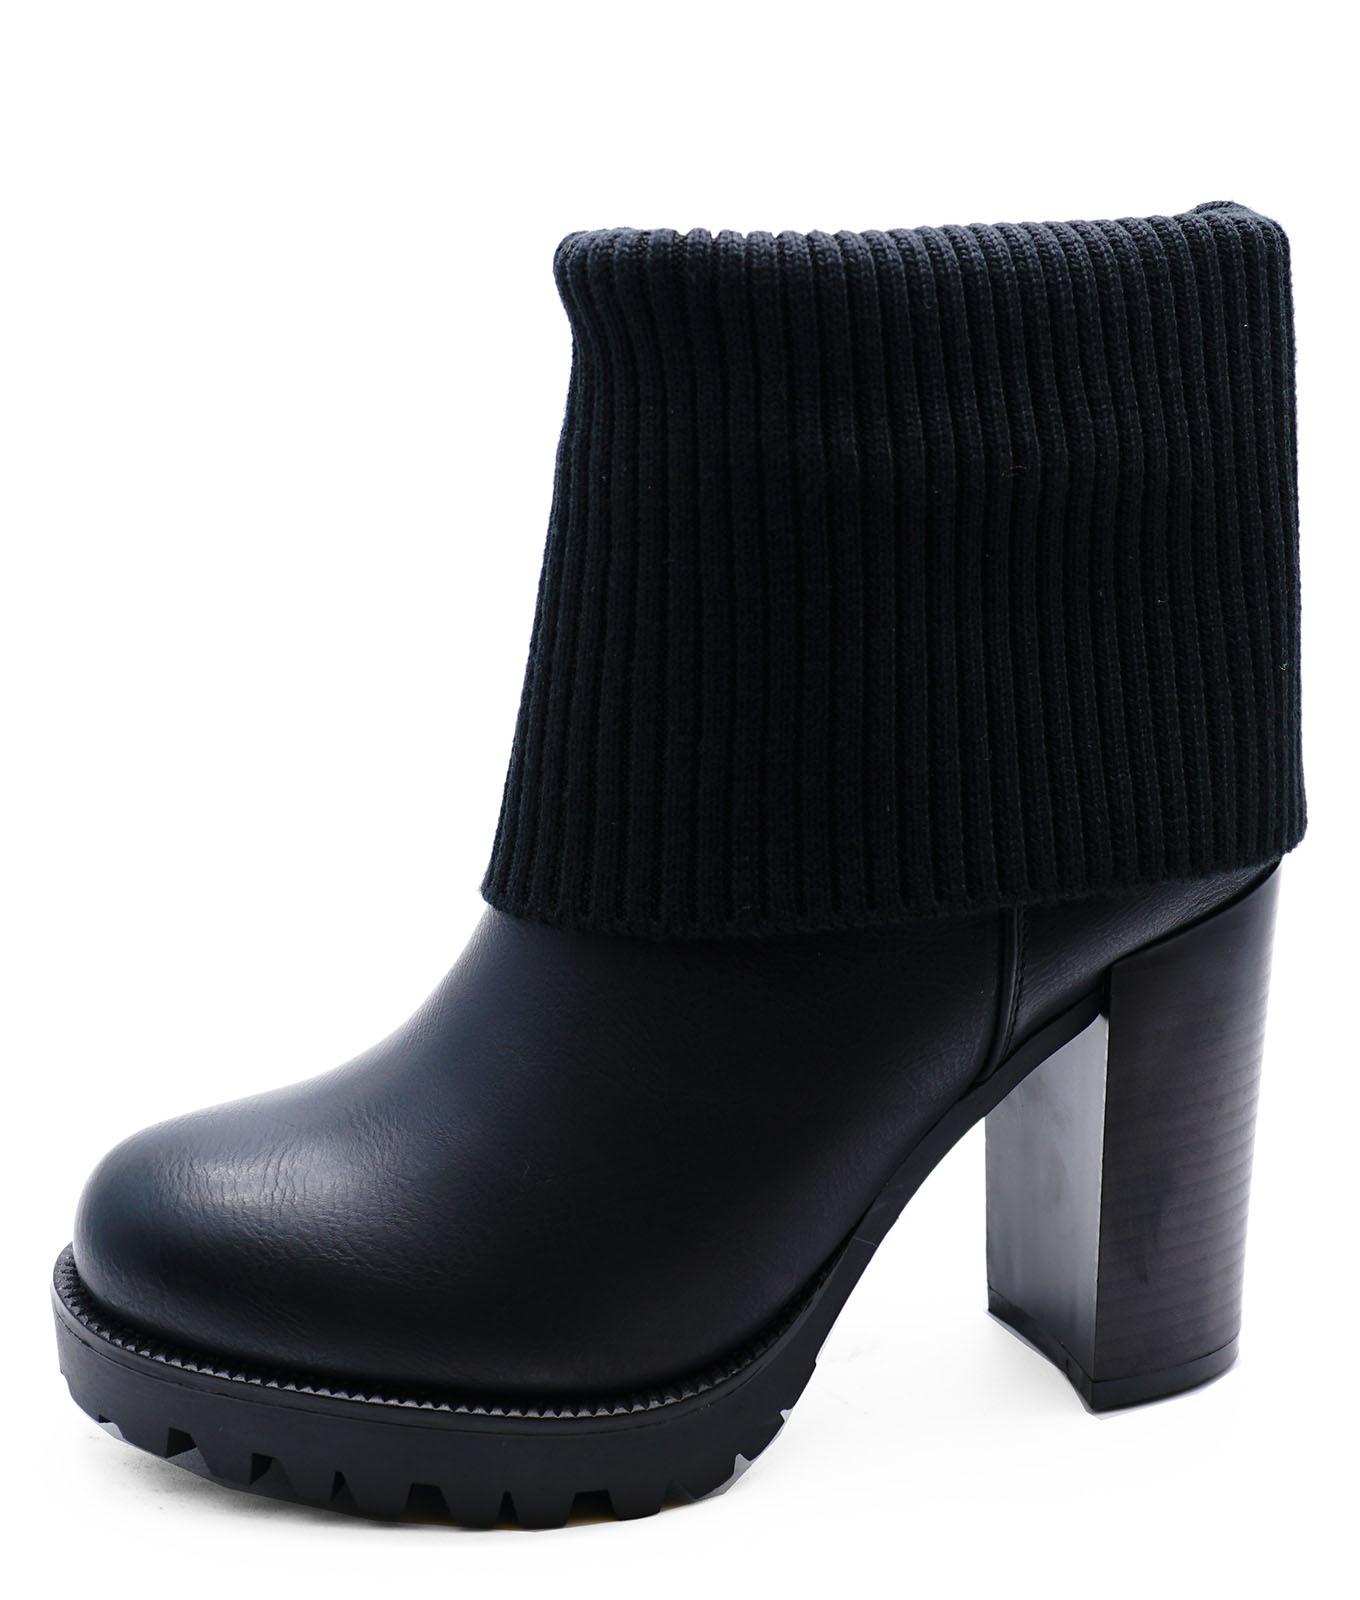 407bae5be20e Sizes Work Shoes Ankle Boots Calf cuff Biker Black Womens Platform 8 3  Smart n01ZvqW